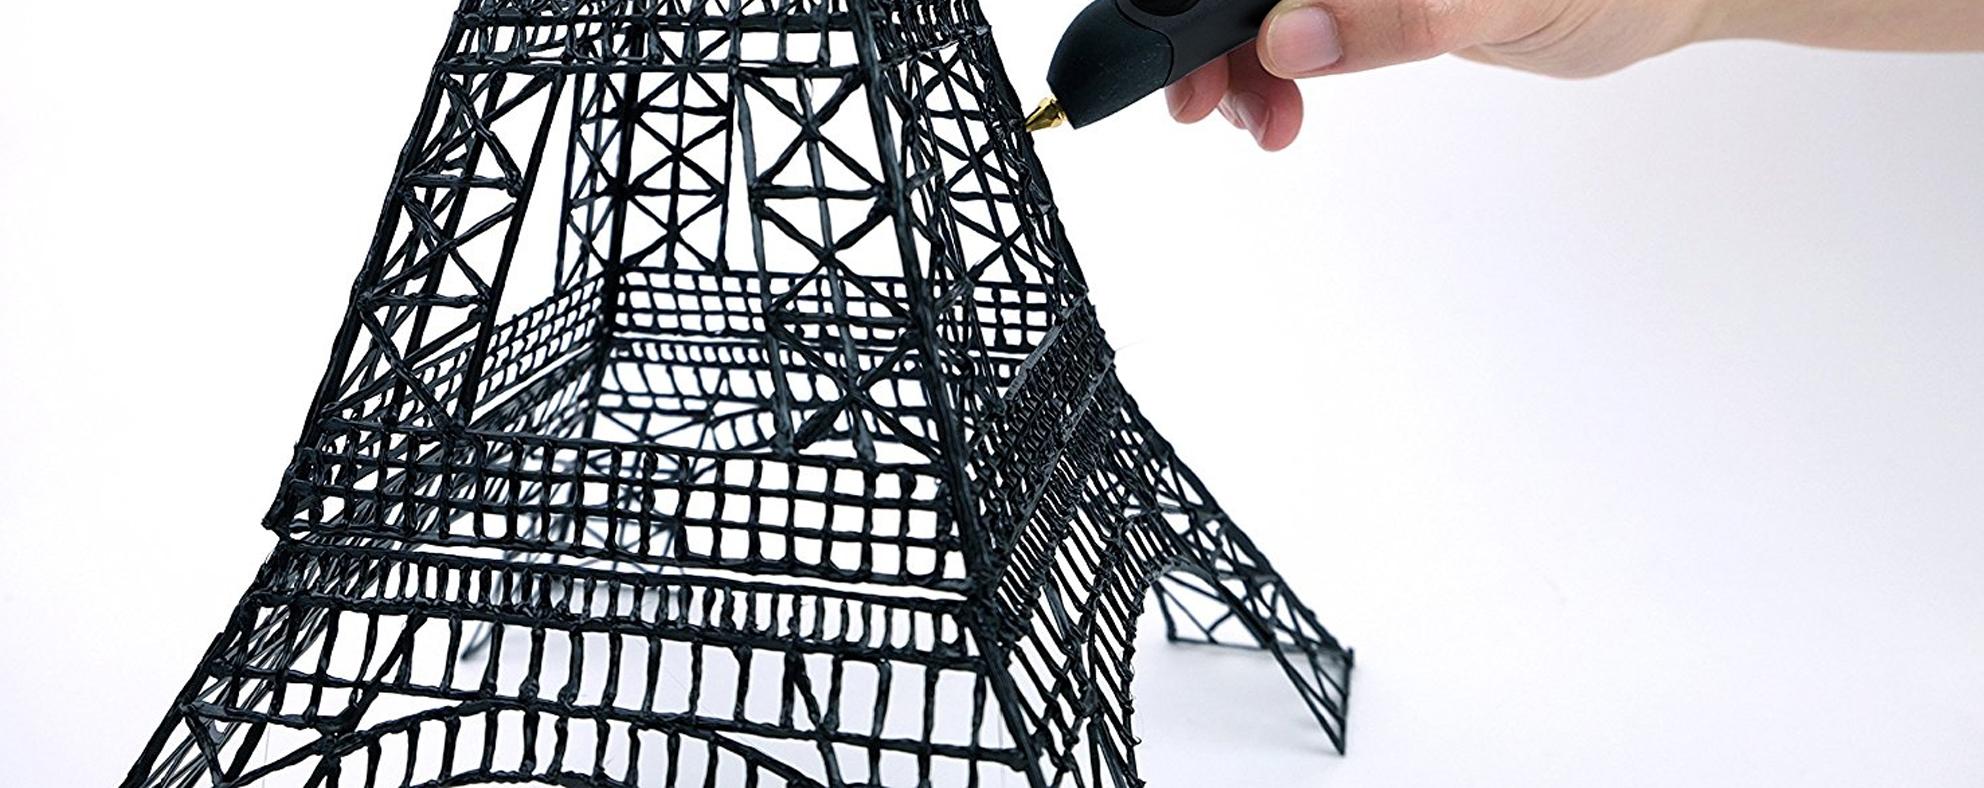 3Style 3D Printing Pen Eiffel Tower Print Sample